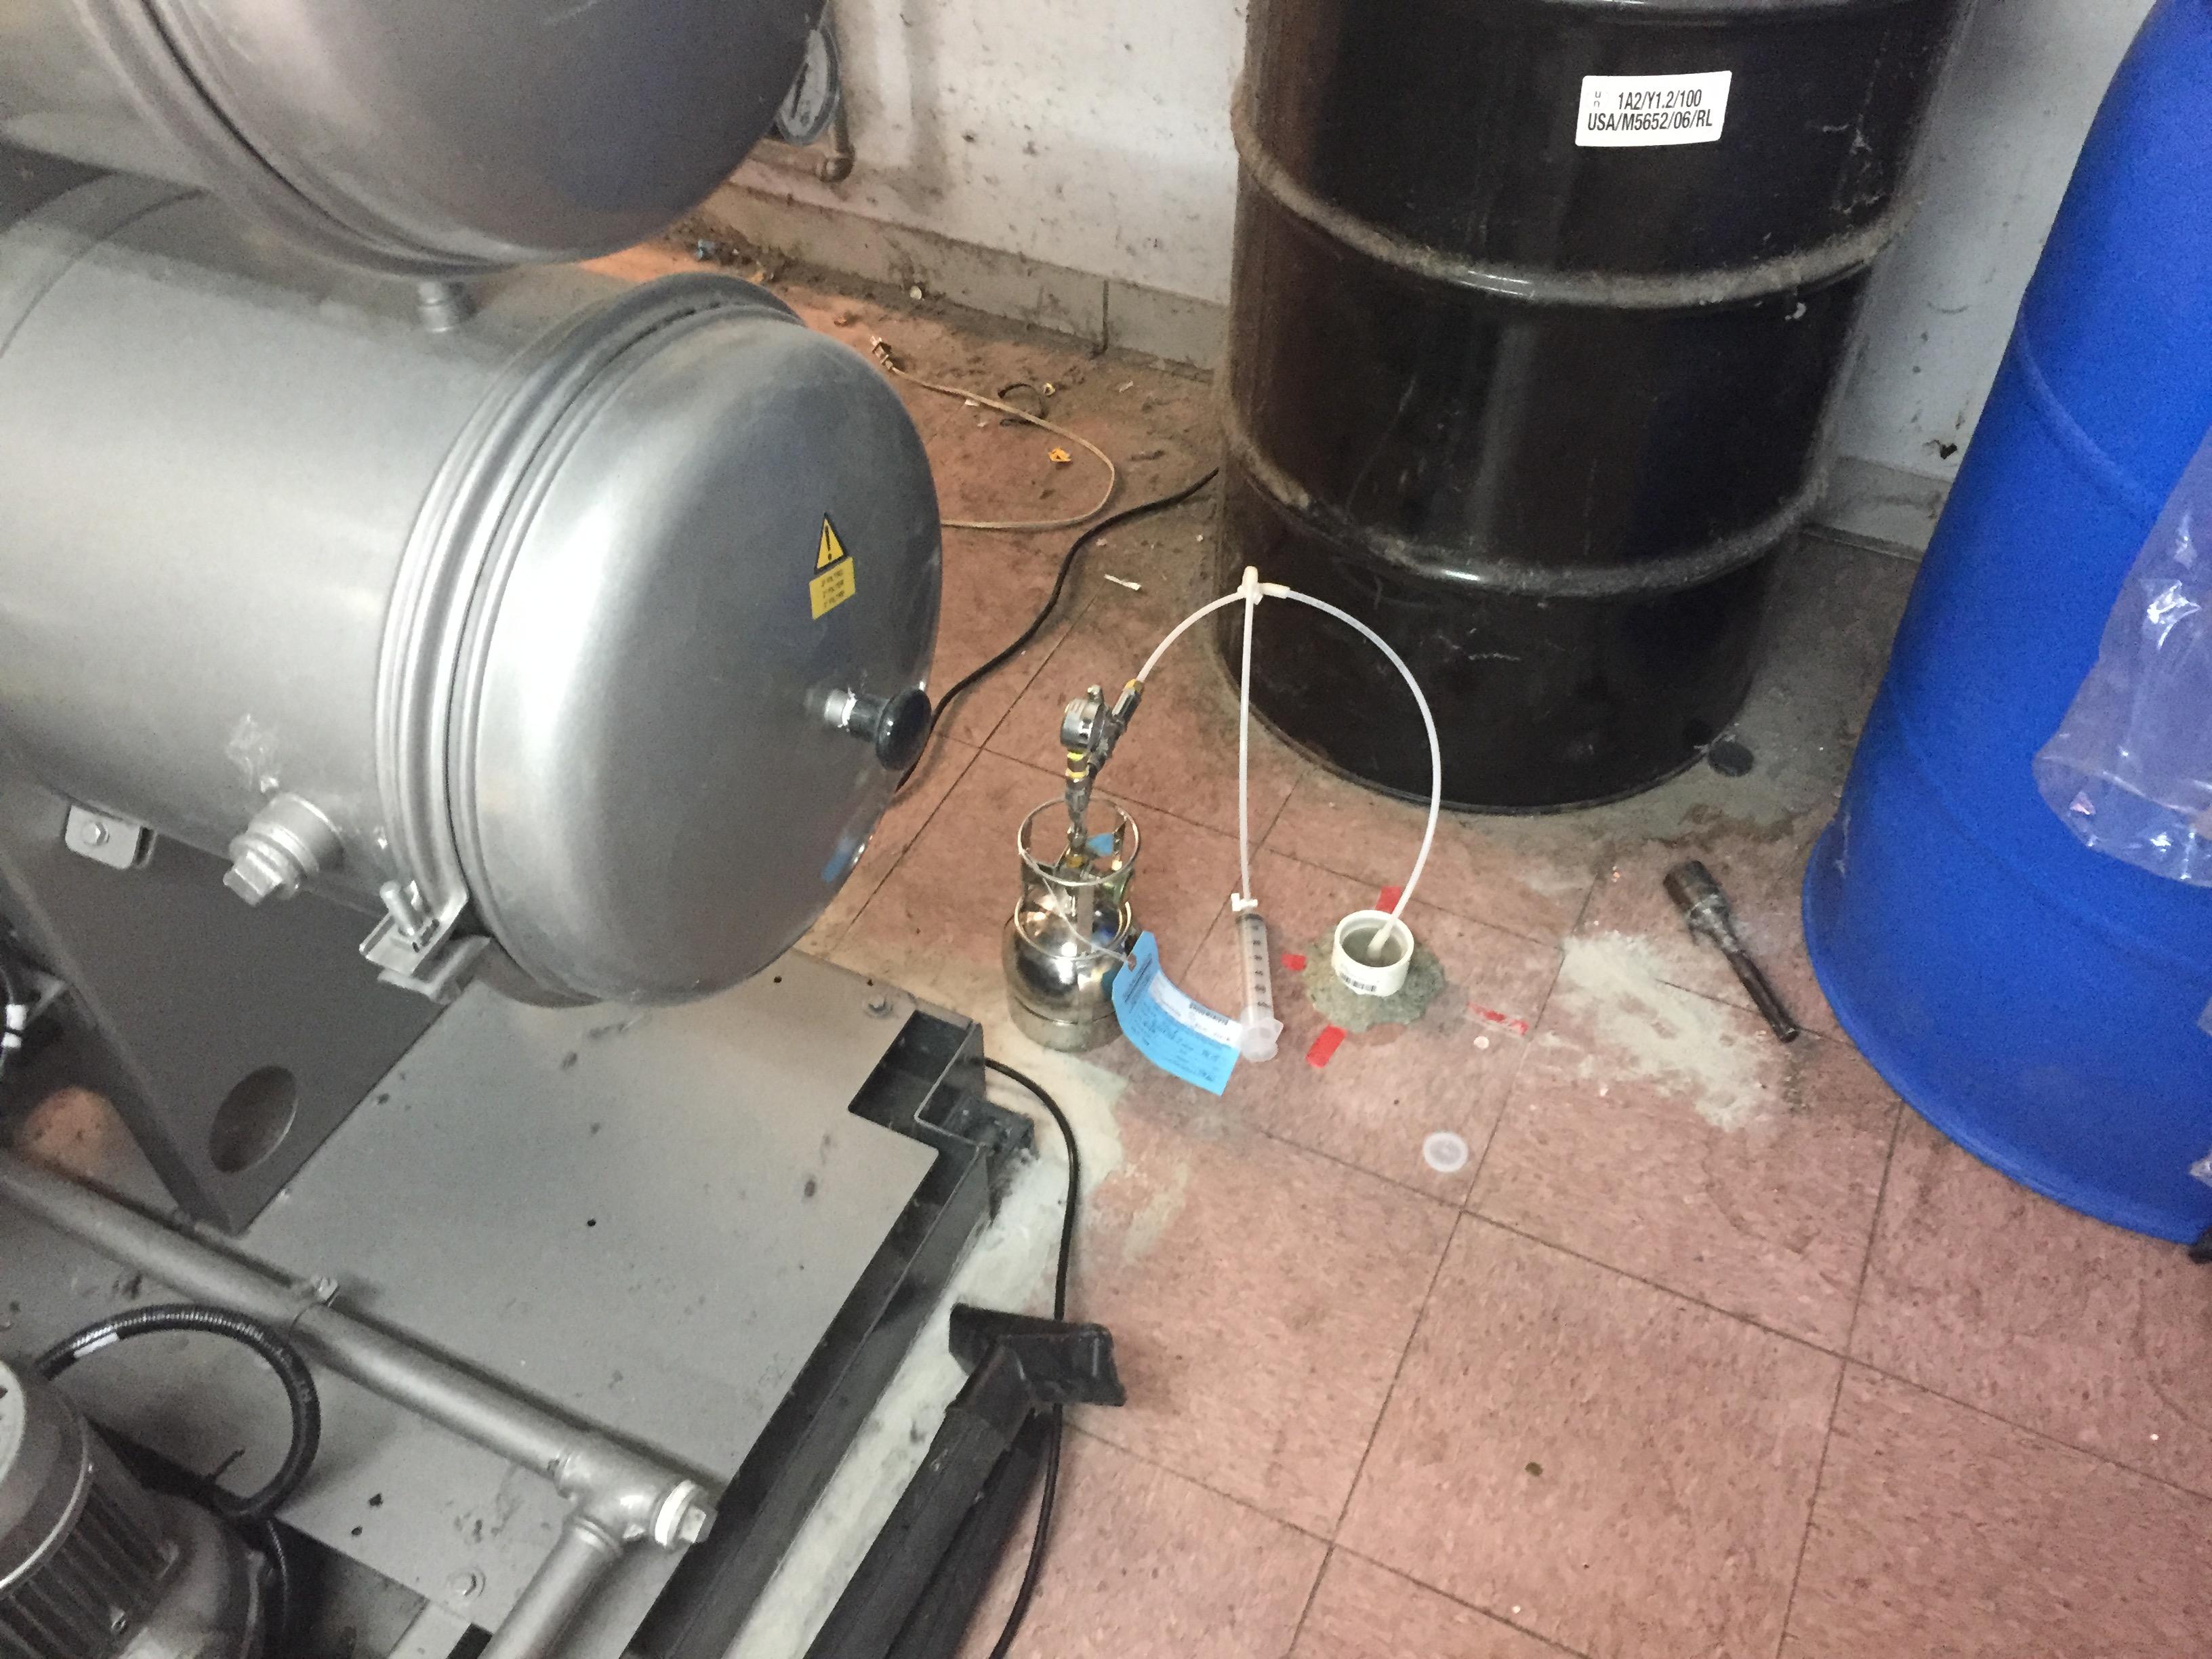 Subslab Soil Gas Sampling at a Dry cleaner in Atlanta, Georgia